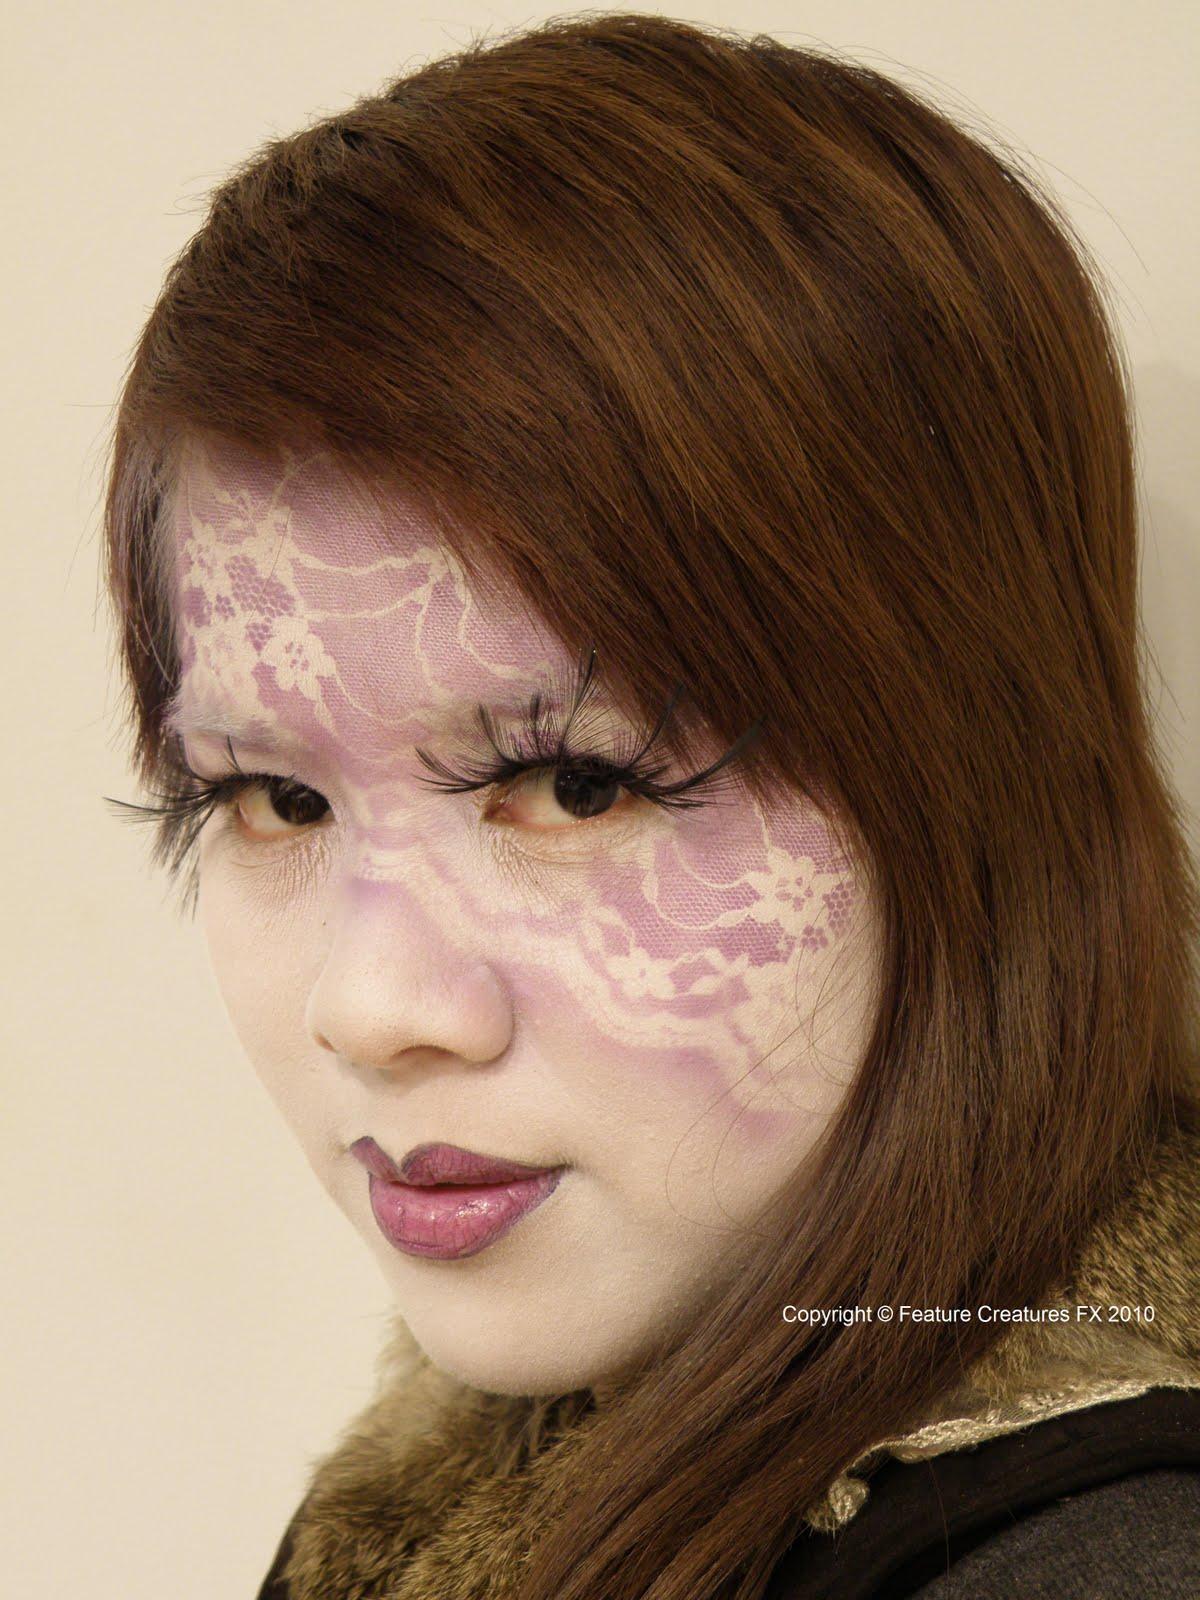 http://2.bp.blogspot.com/_XE7gIhkmZLA/TIQj-dQSbeI/AAAAAAAAArM/L0wjoQDNISQ/s1600/Airbrushing+Lam+stencil+3+C+2010.JPG